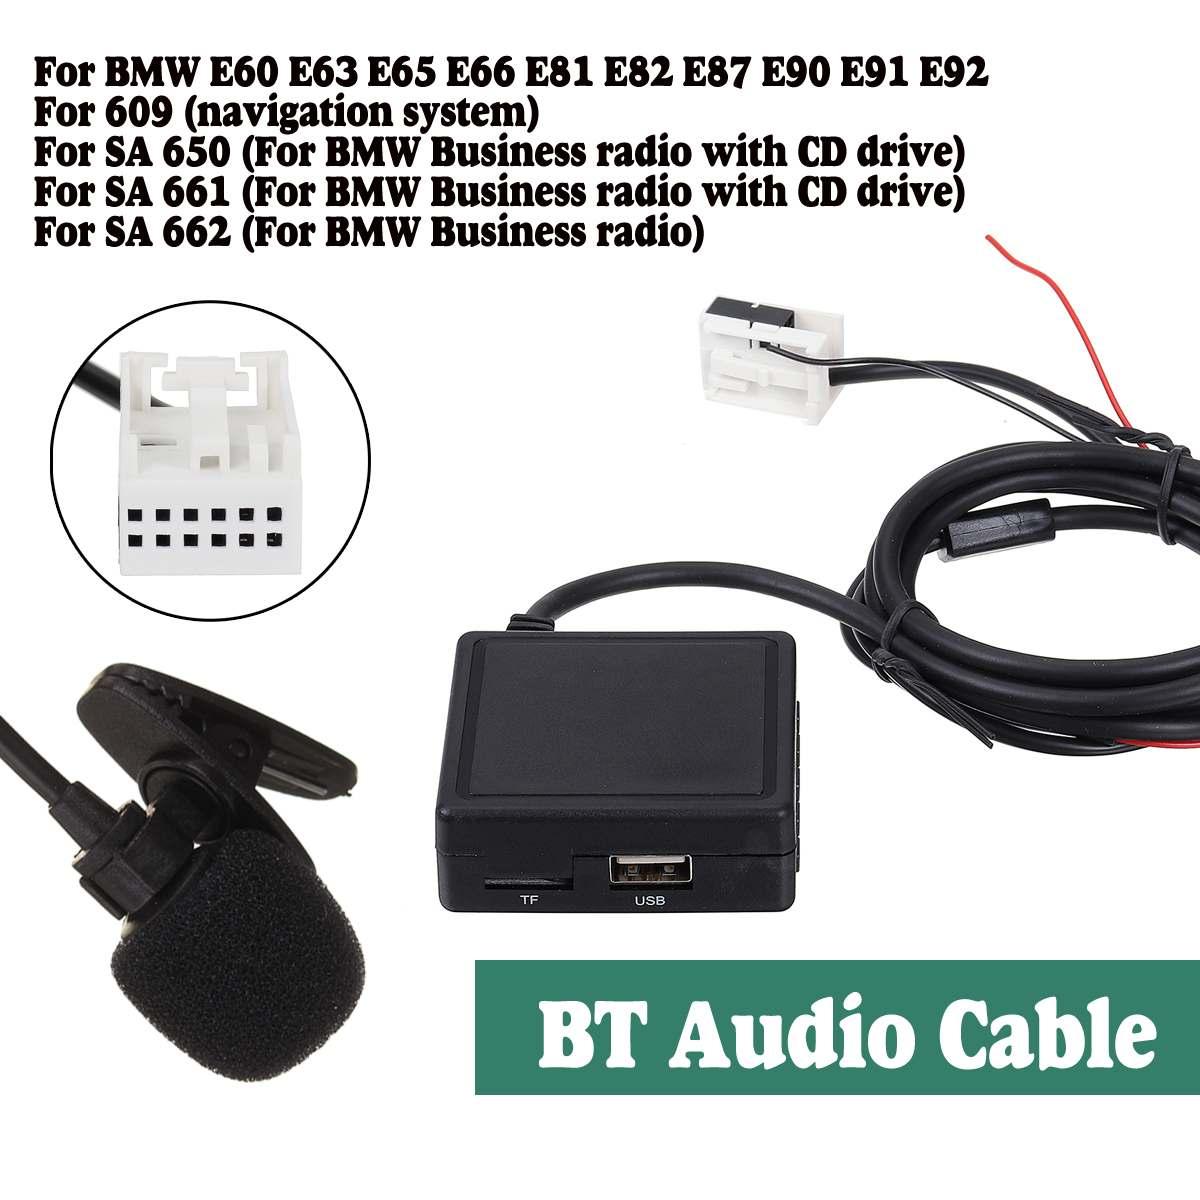 HIFI Audio SD MIC USB Audio bluetooth Receiver Cable Adaptor Radio Stereo For BMW E60 E63 E65 E66 E81 E82 E87 E90